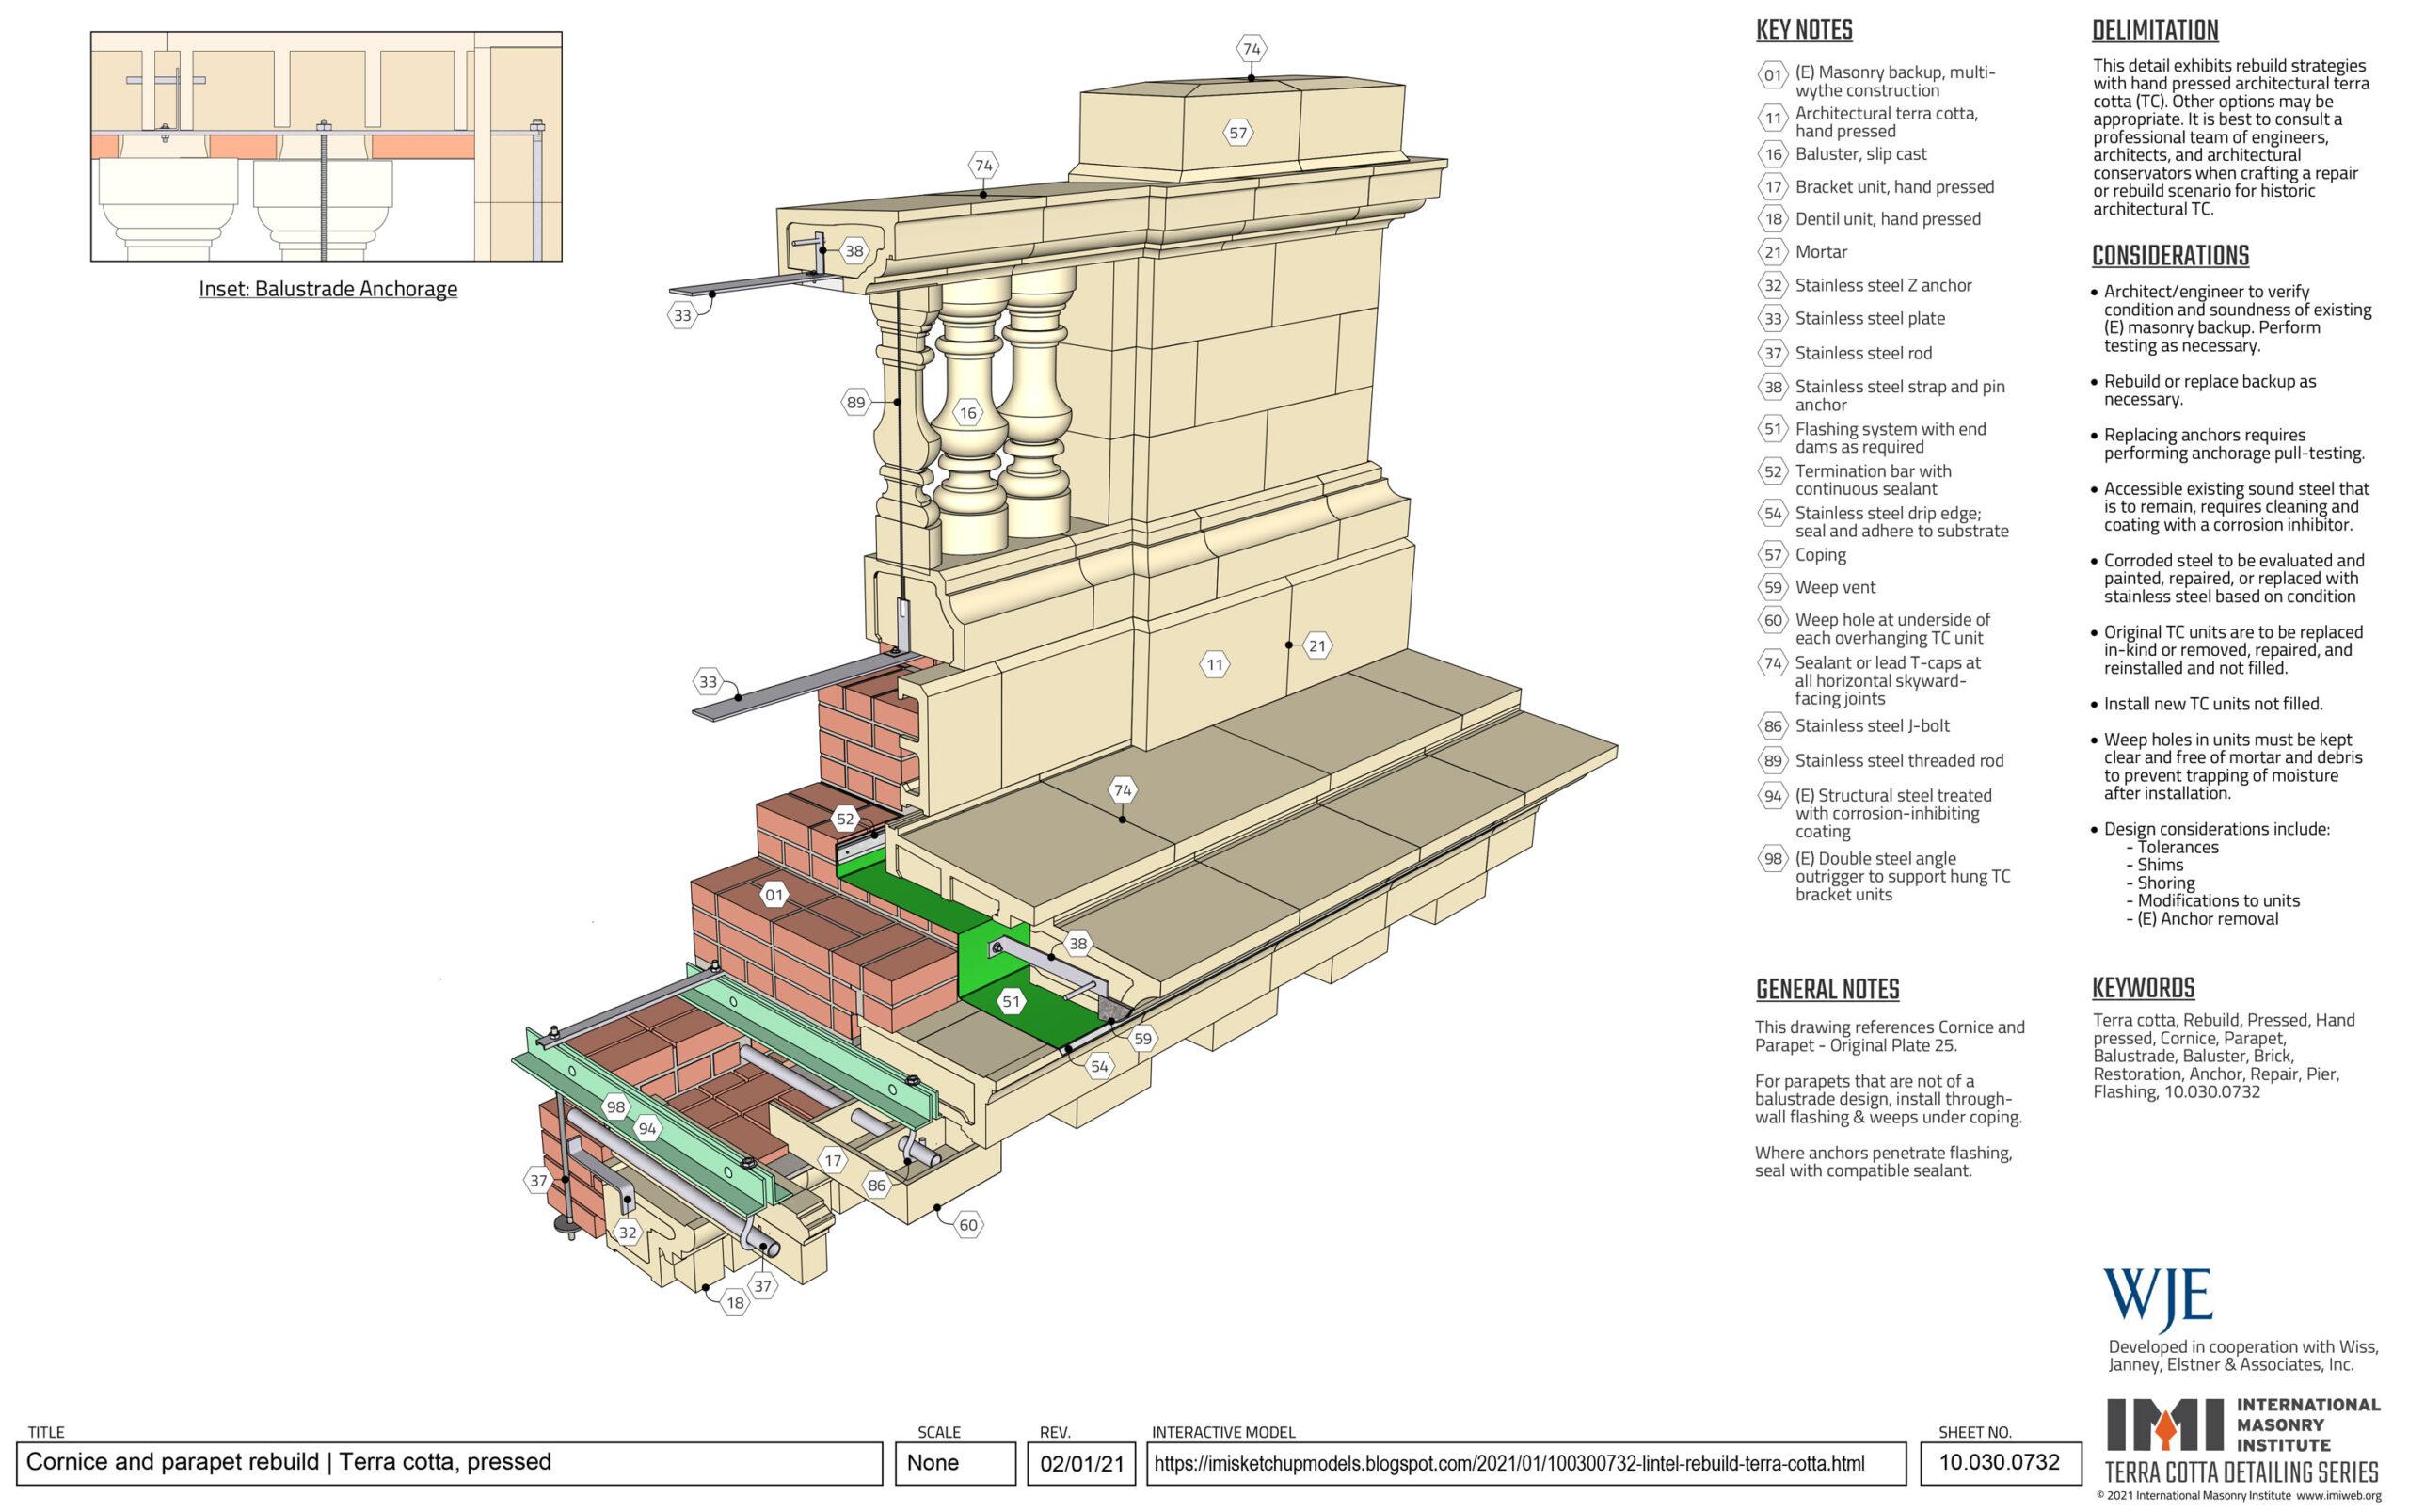 Pressed terra cotta cornice and parapet rebuild detail